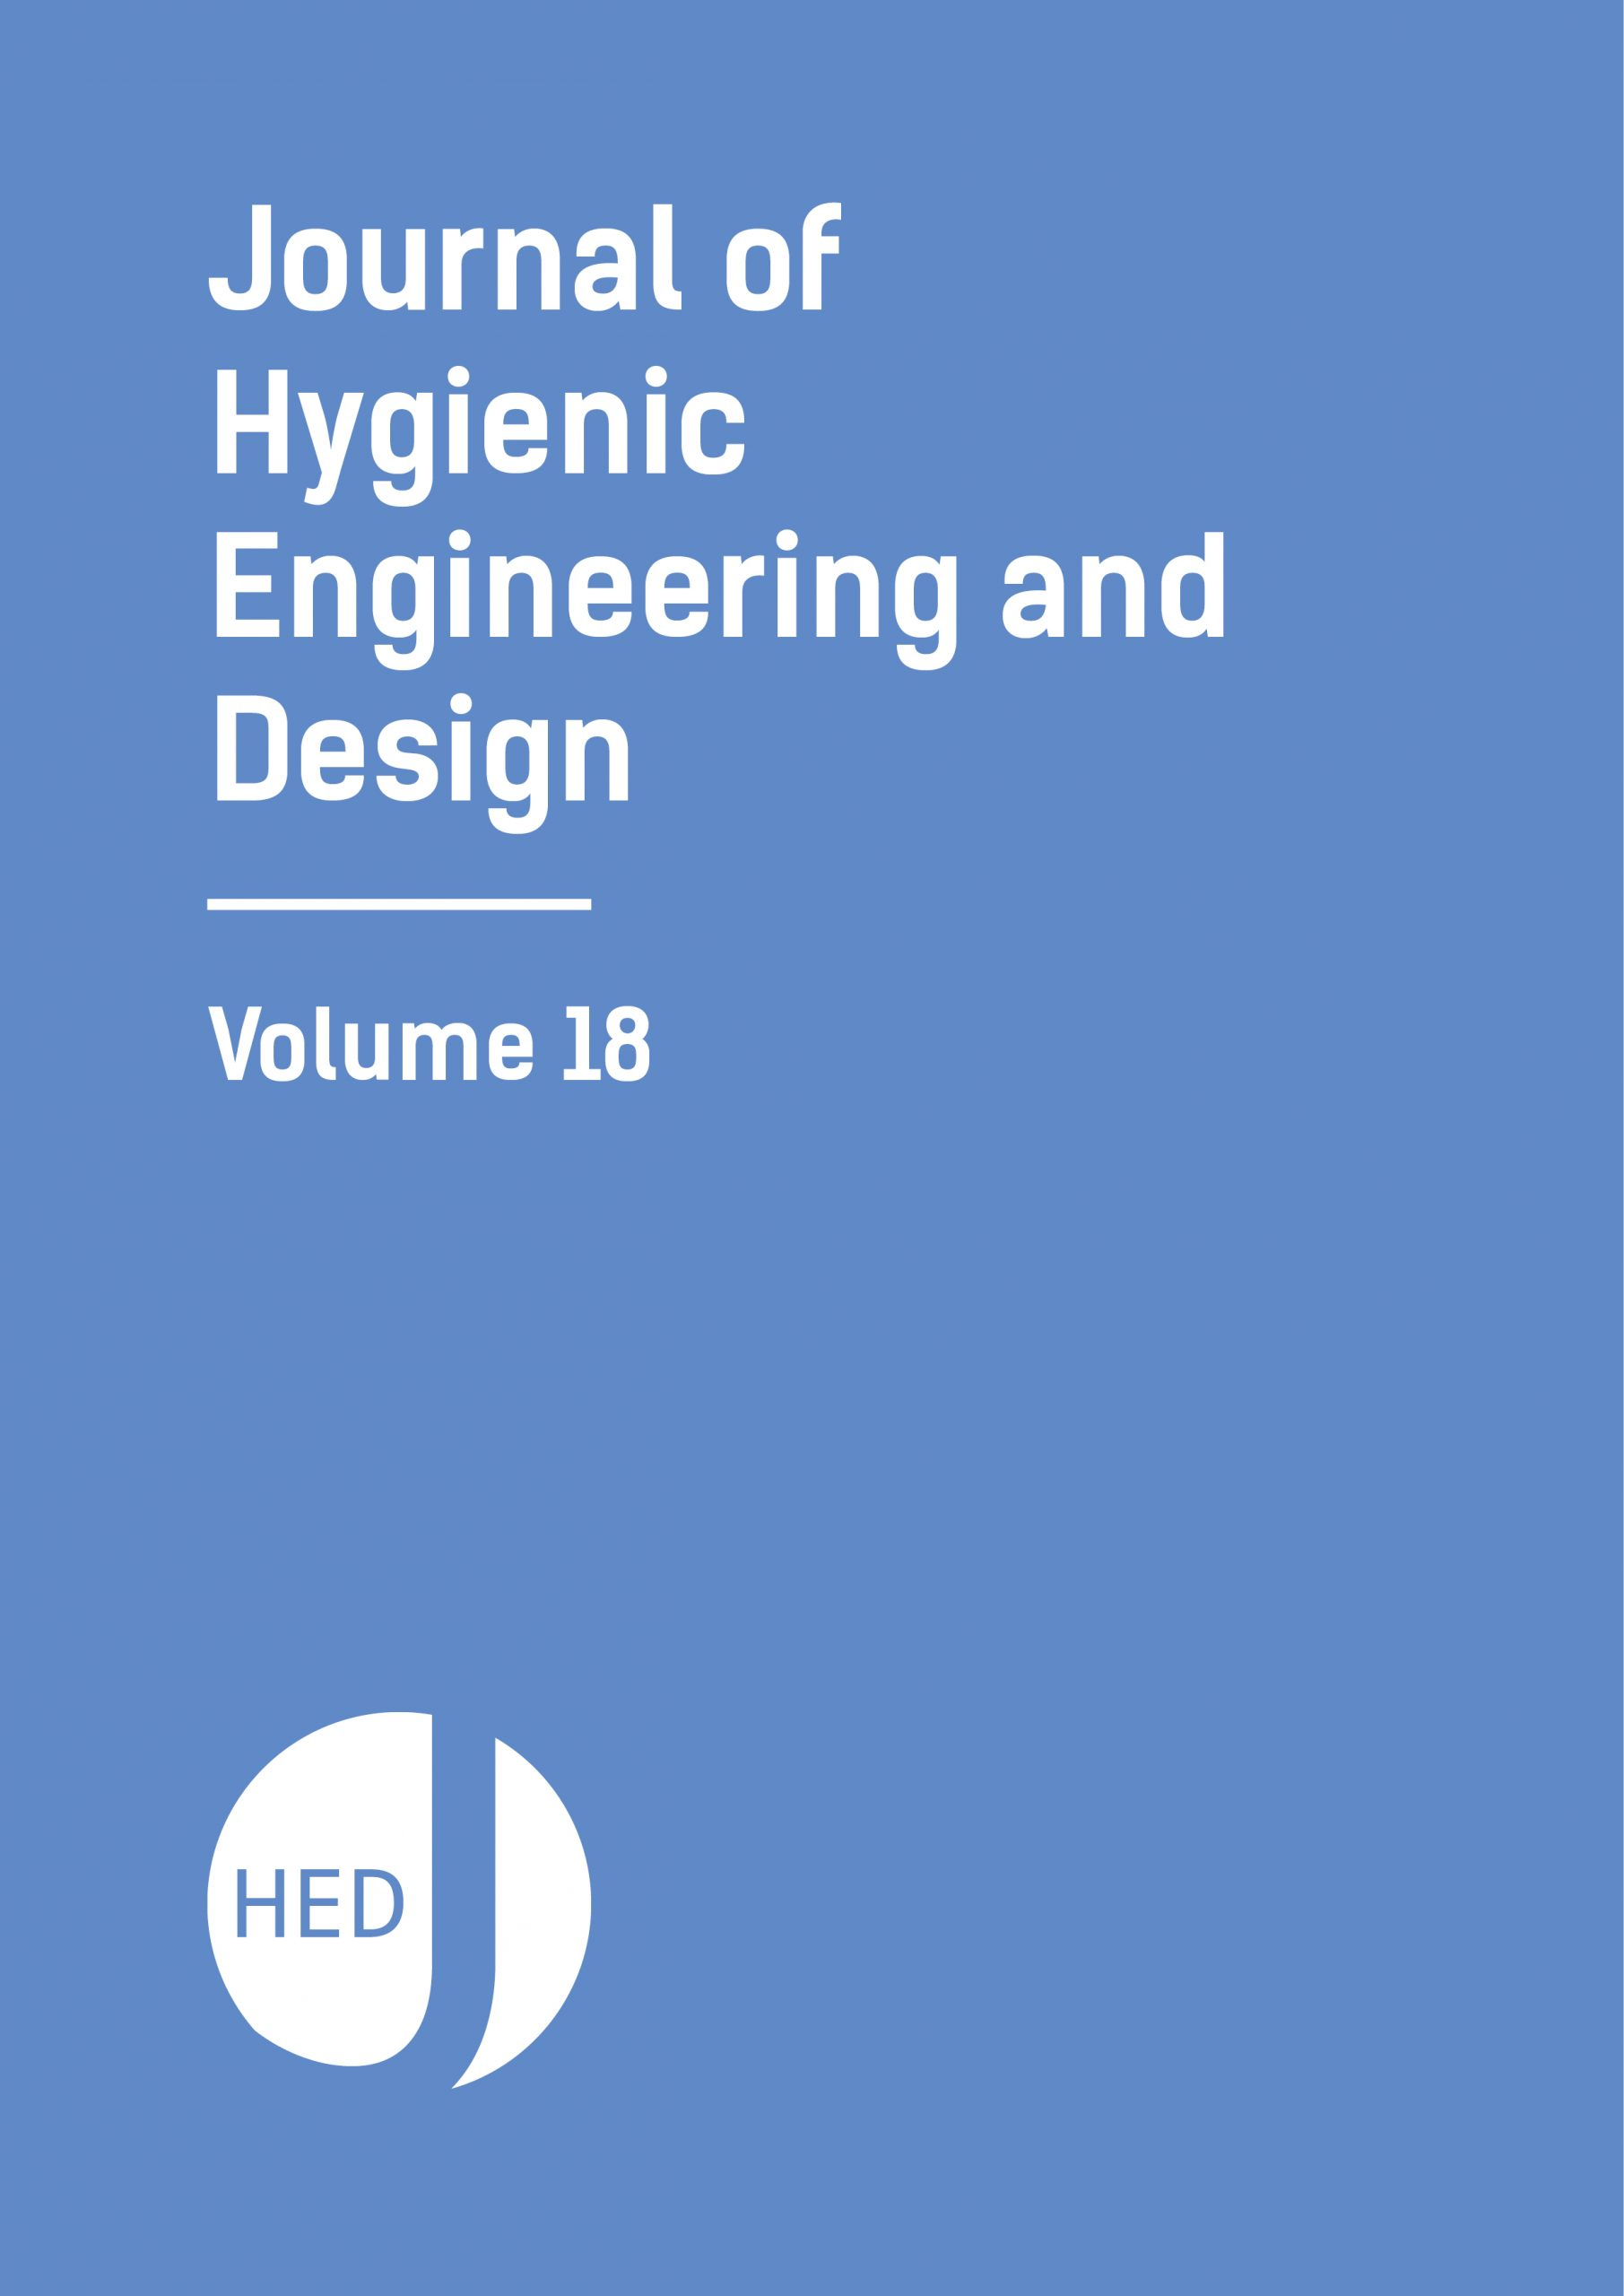 JHED Volume 18